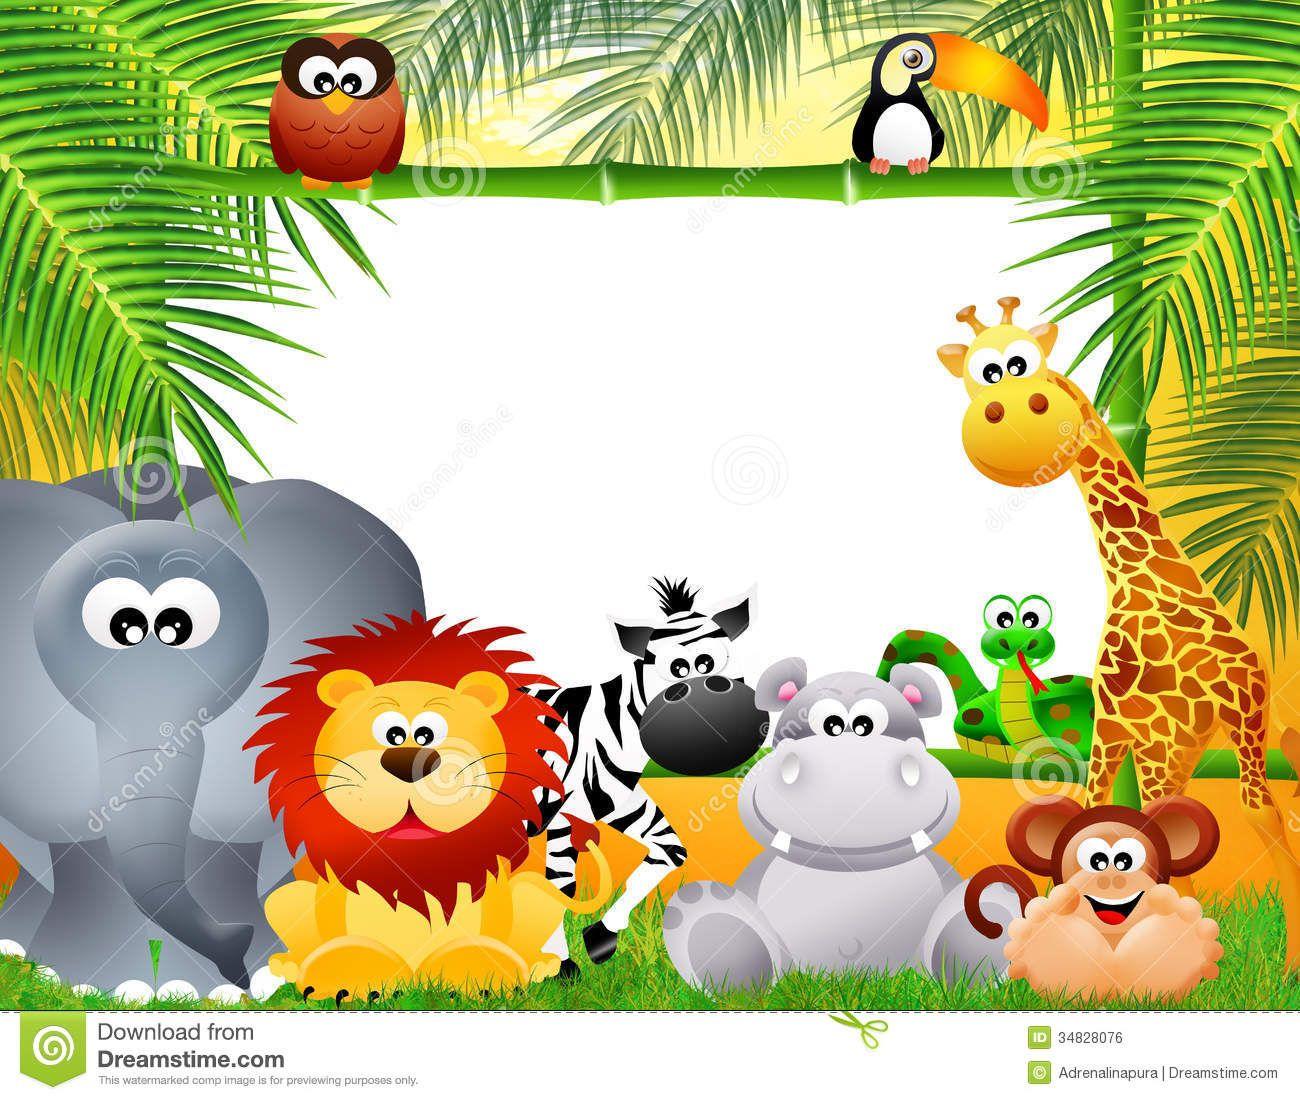 Zoo Animals Cartoon Royalty Free Stock Image.